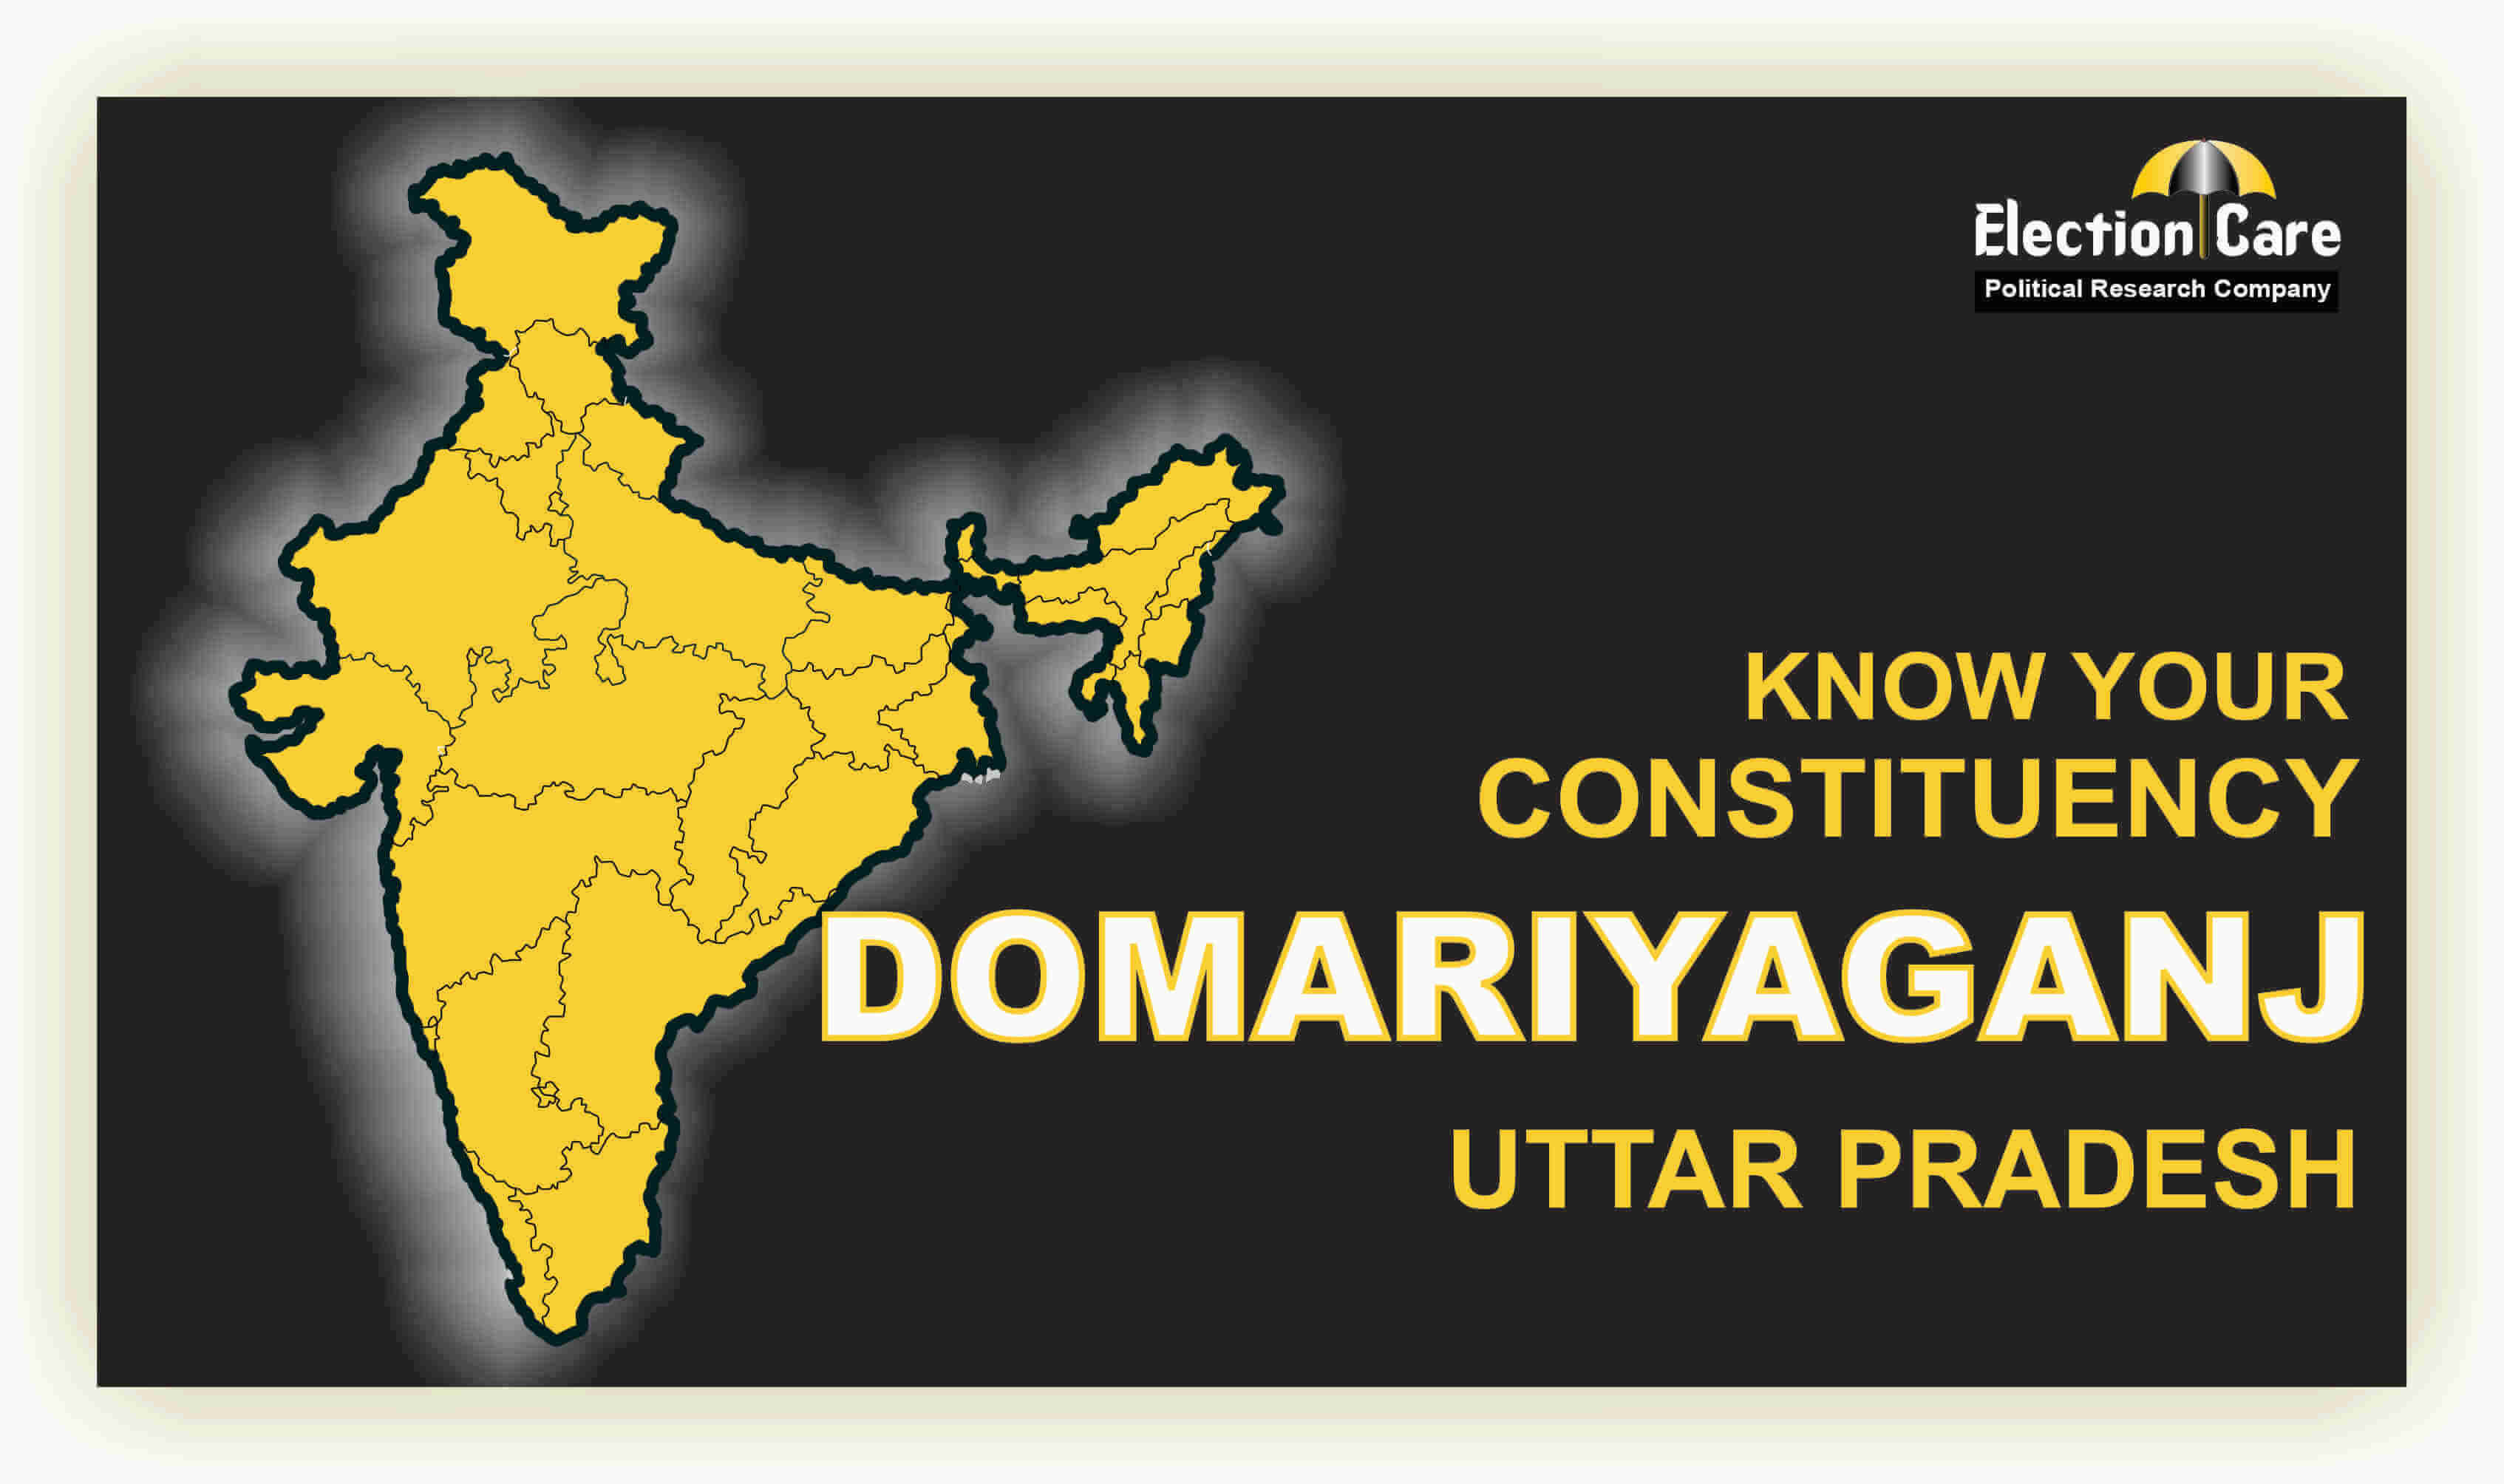 Domariyaganj Parliament Election Result